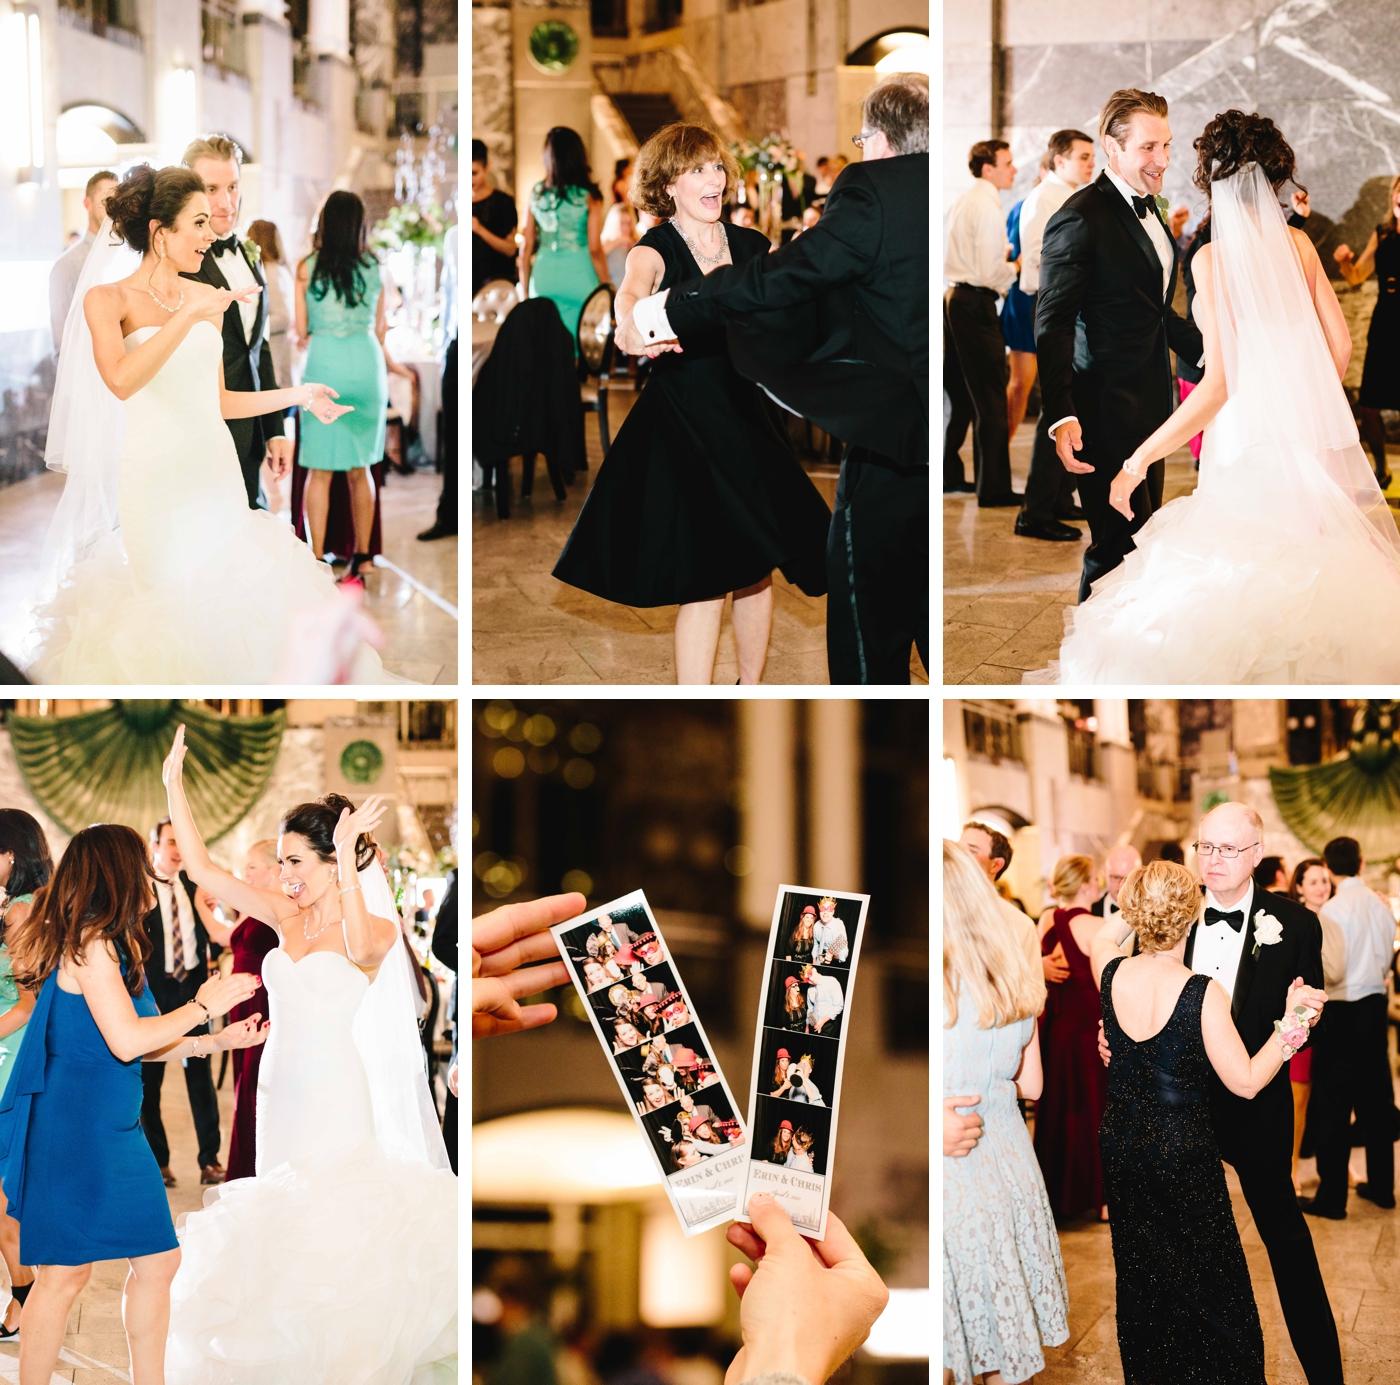 chicago-fine-art-wedding-photography-hamm66